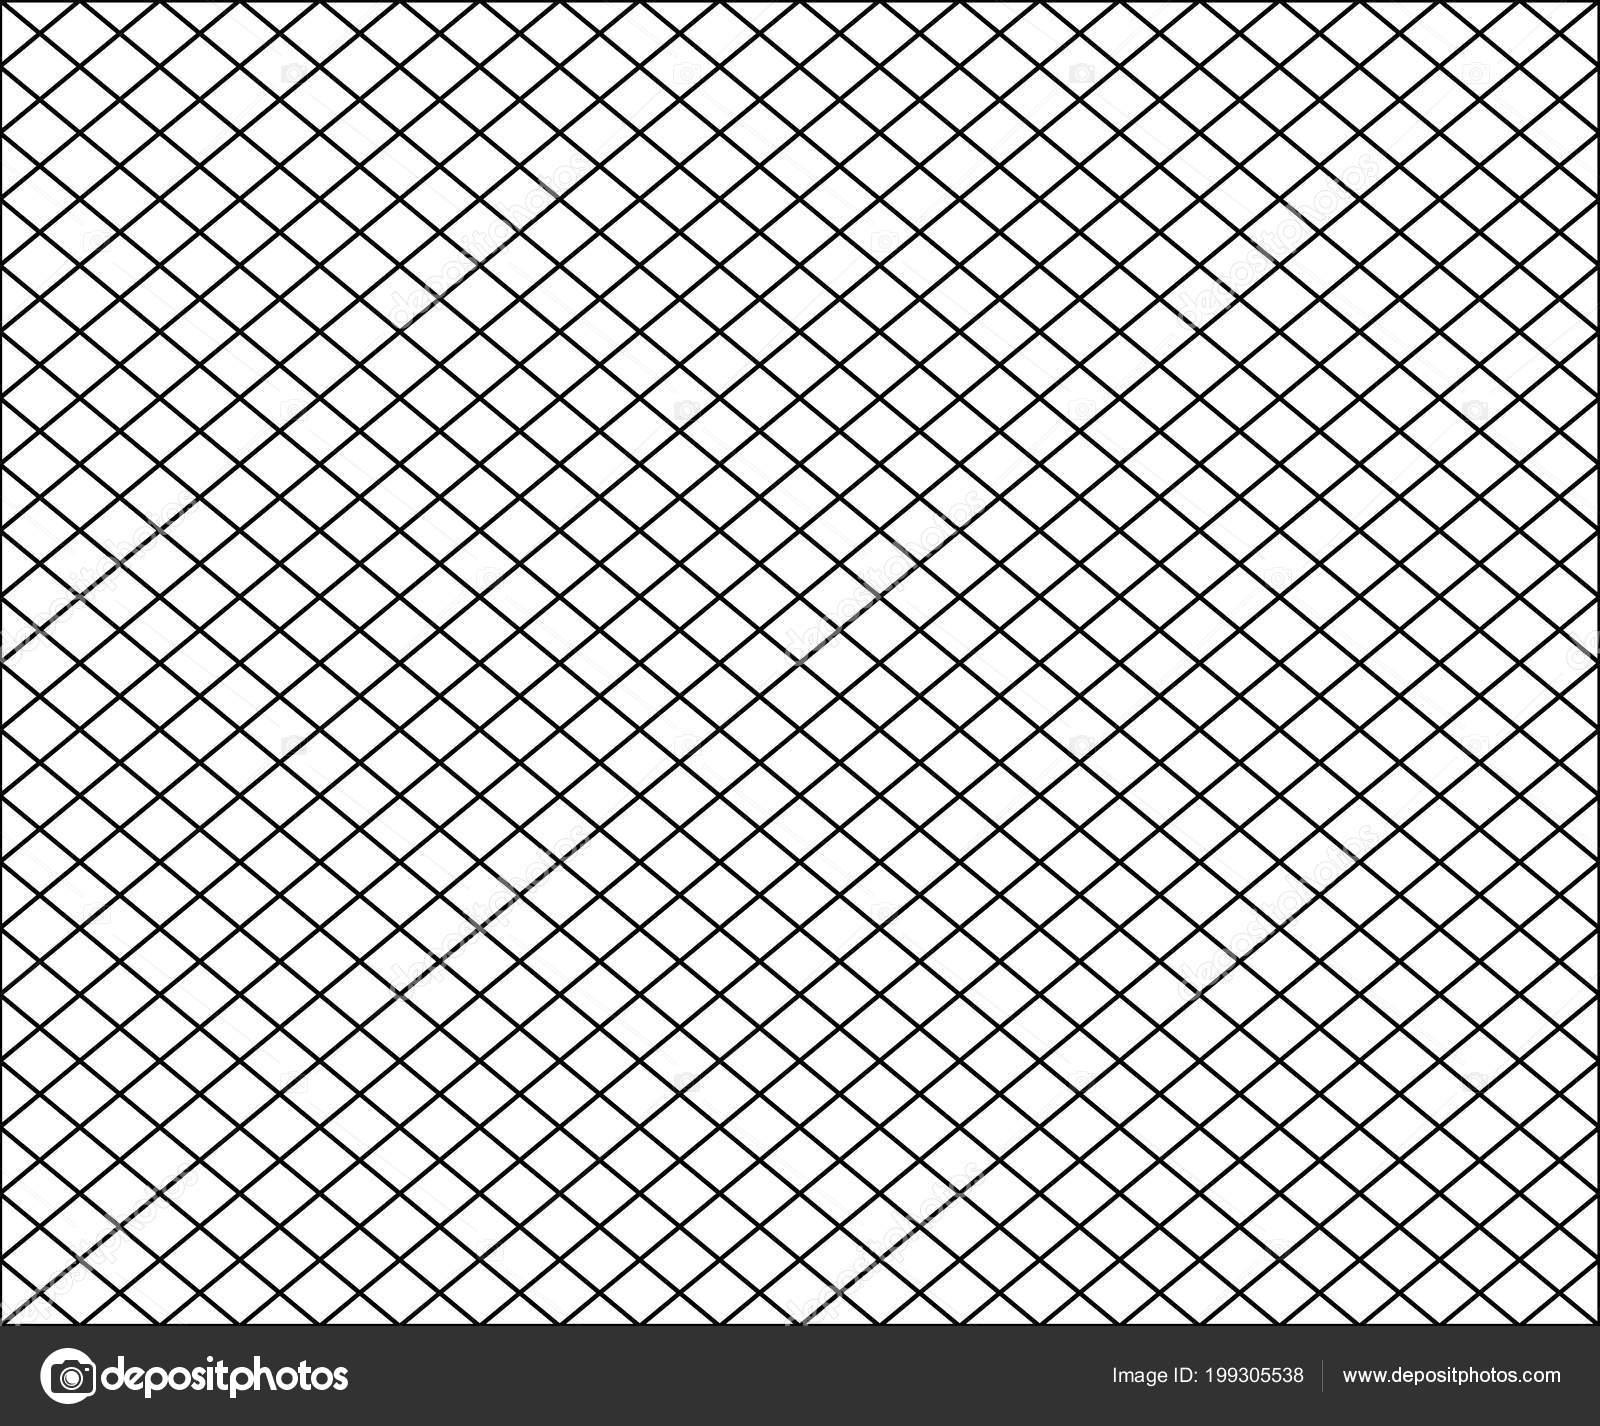 Seamless Net Texture Pattern Black Squares White ...